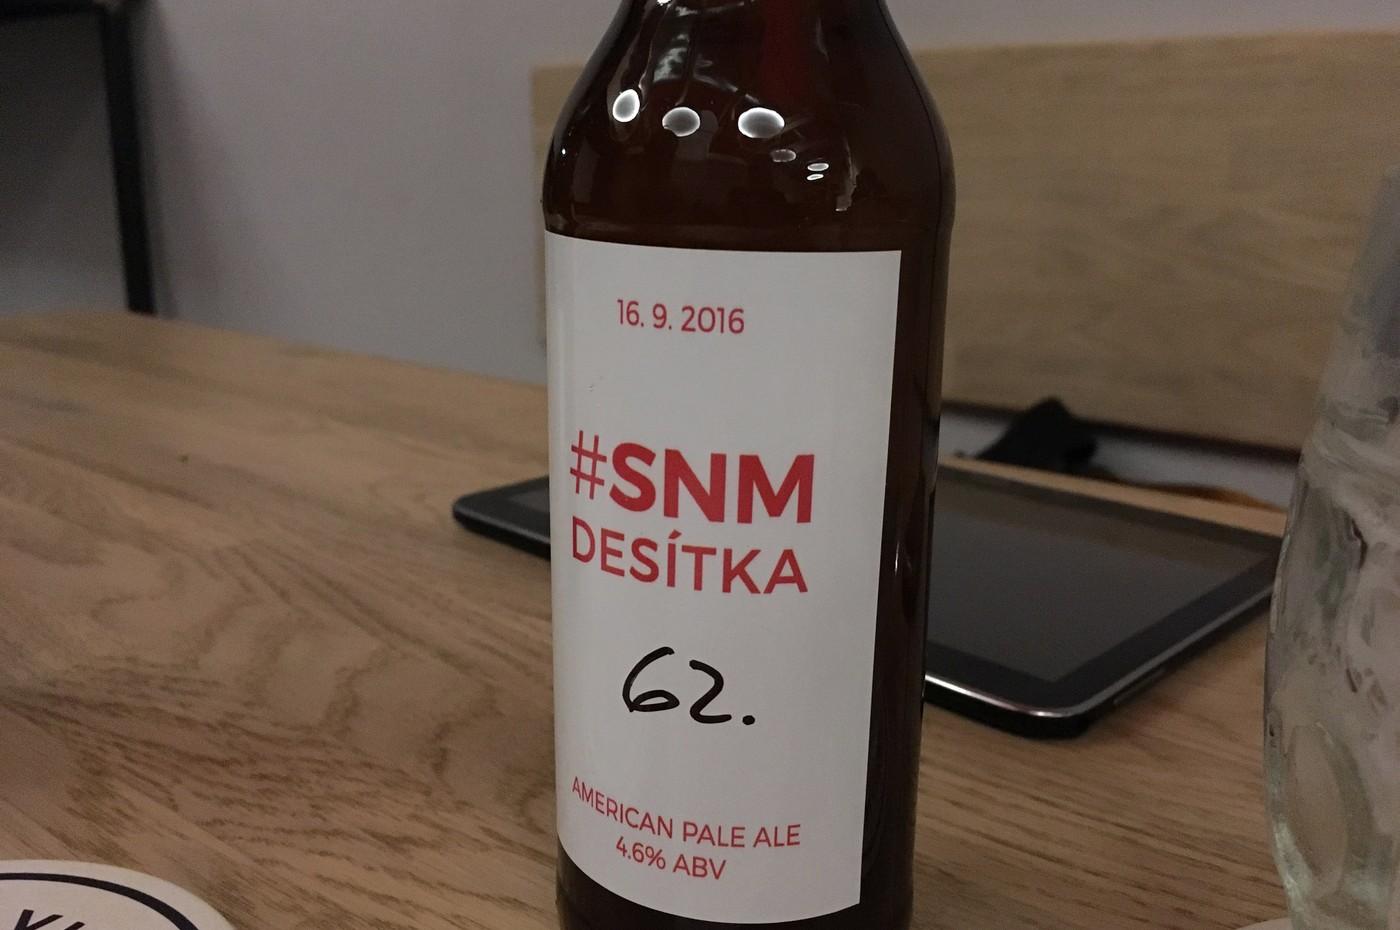 SNM desítka (pivo)